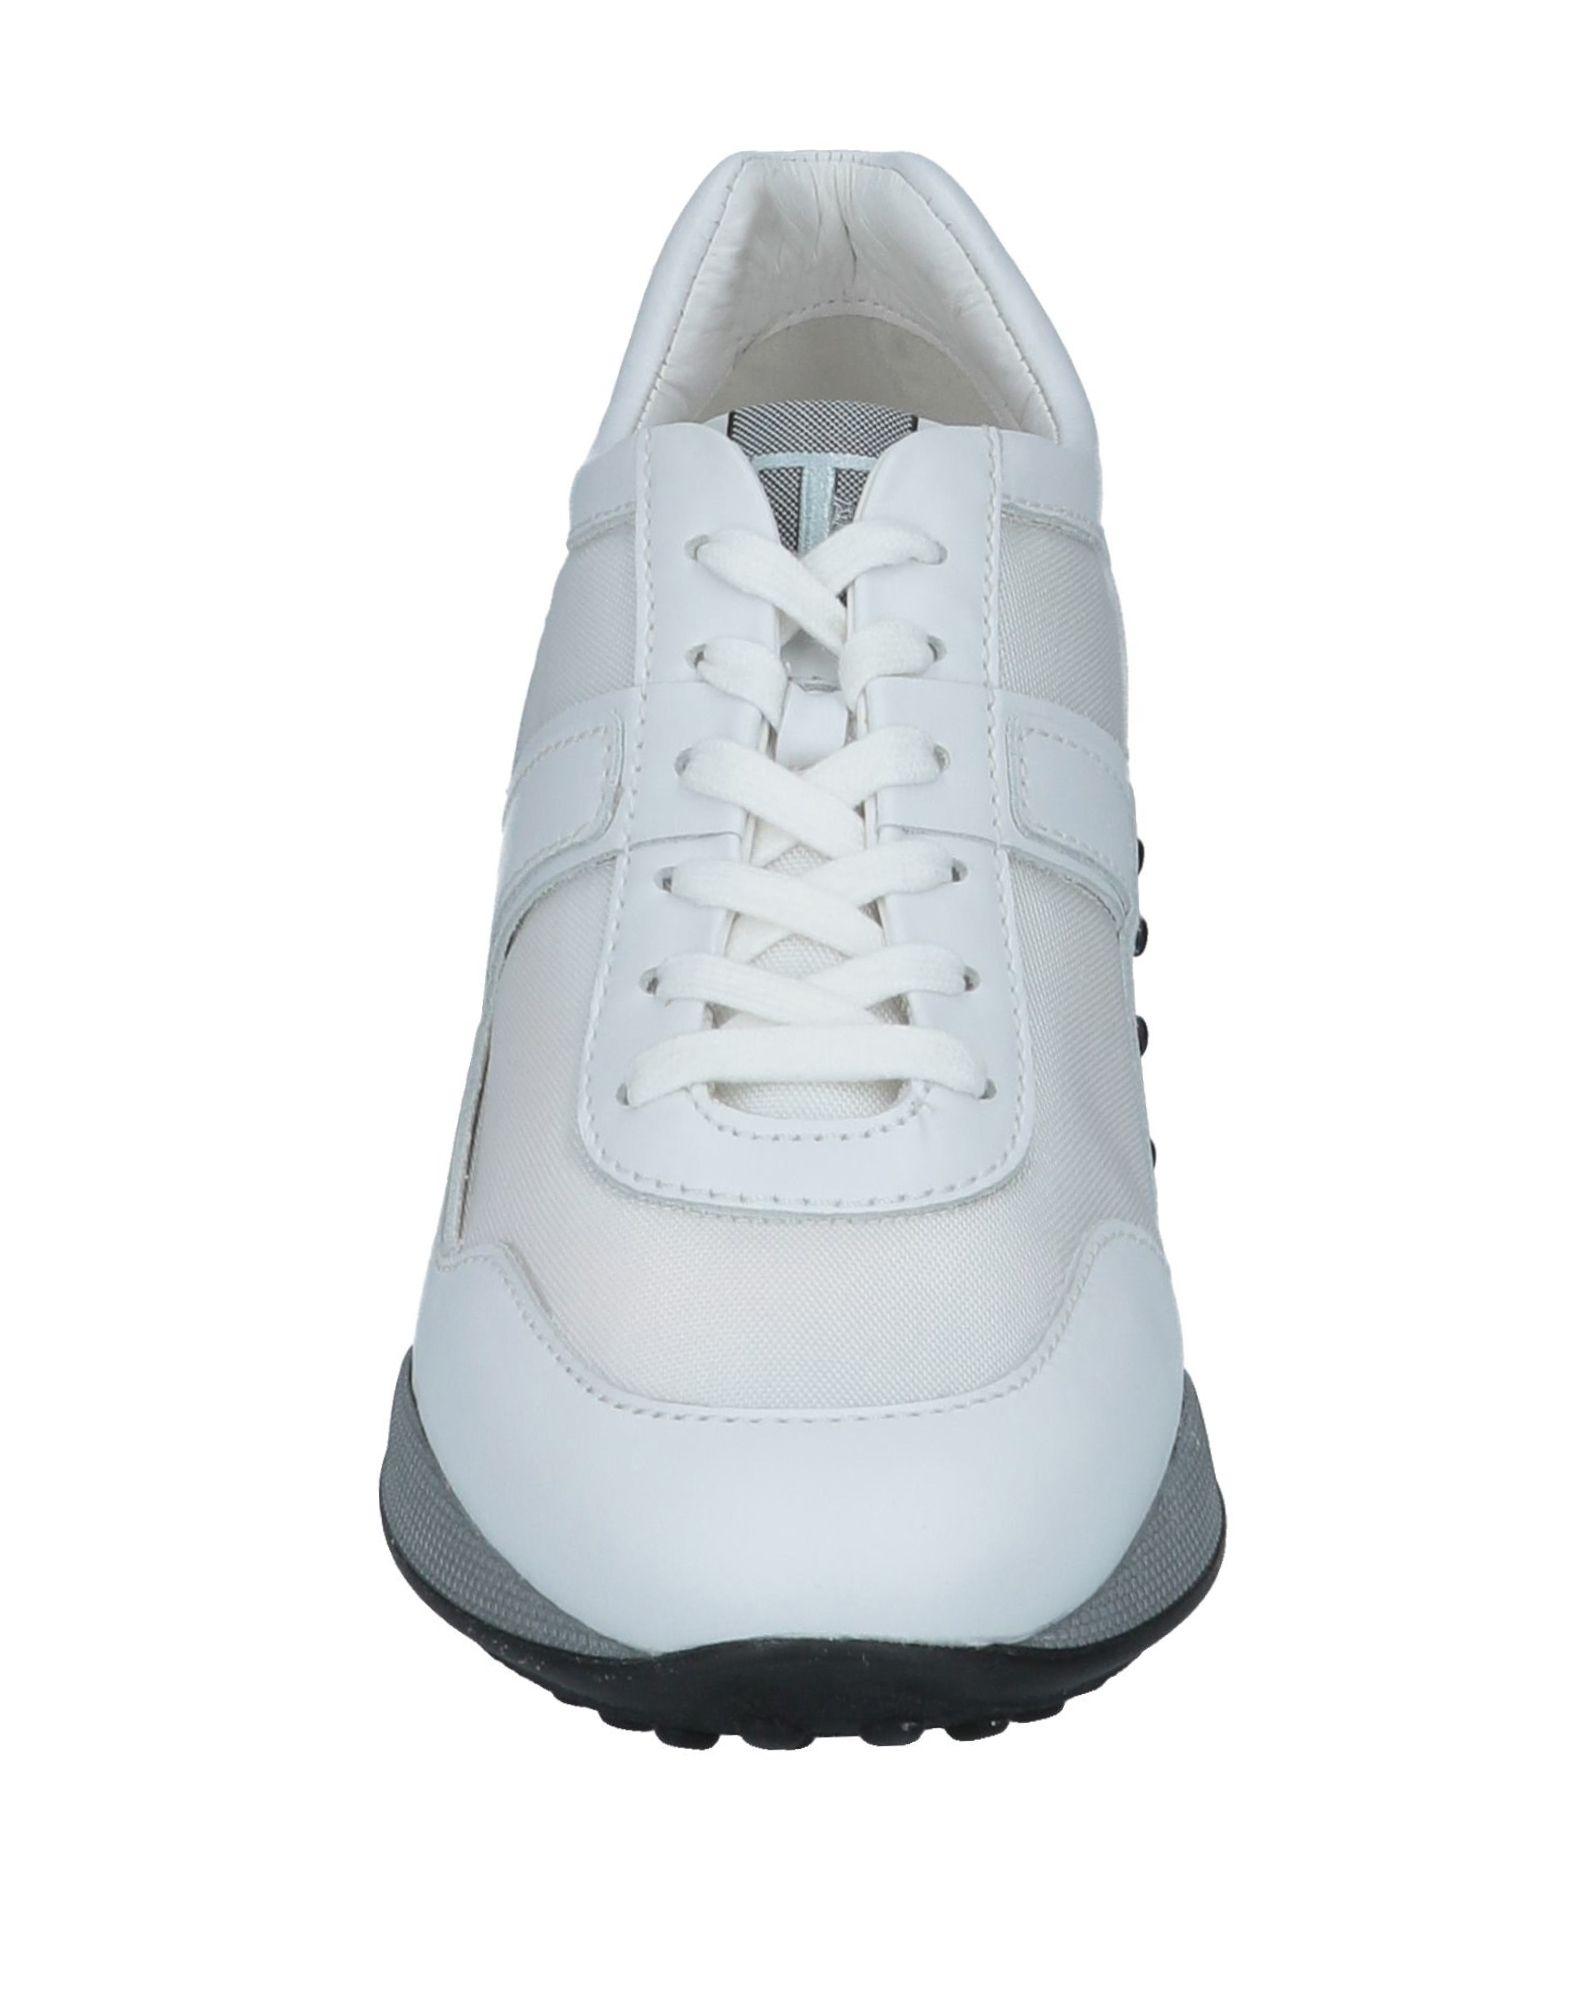 Rabatt Schuhe Sneakers Tod's Sneakers Schuhe Damen  11550381KX 92a34f